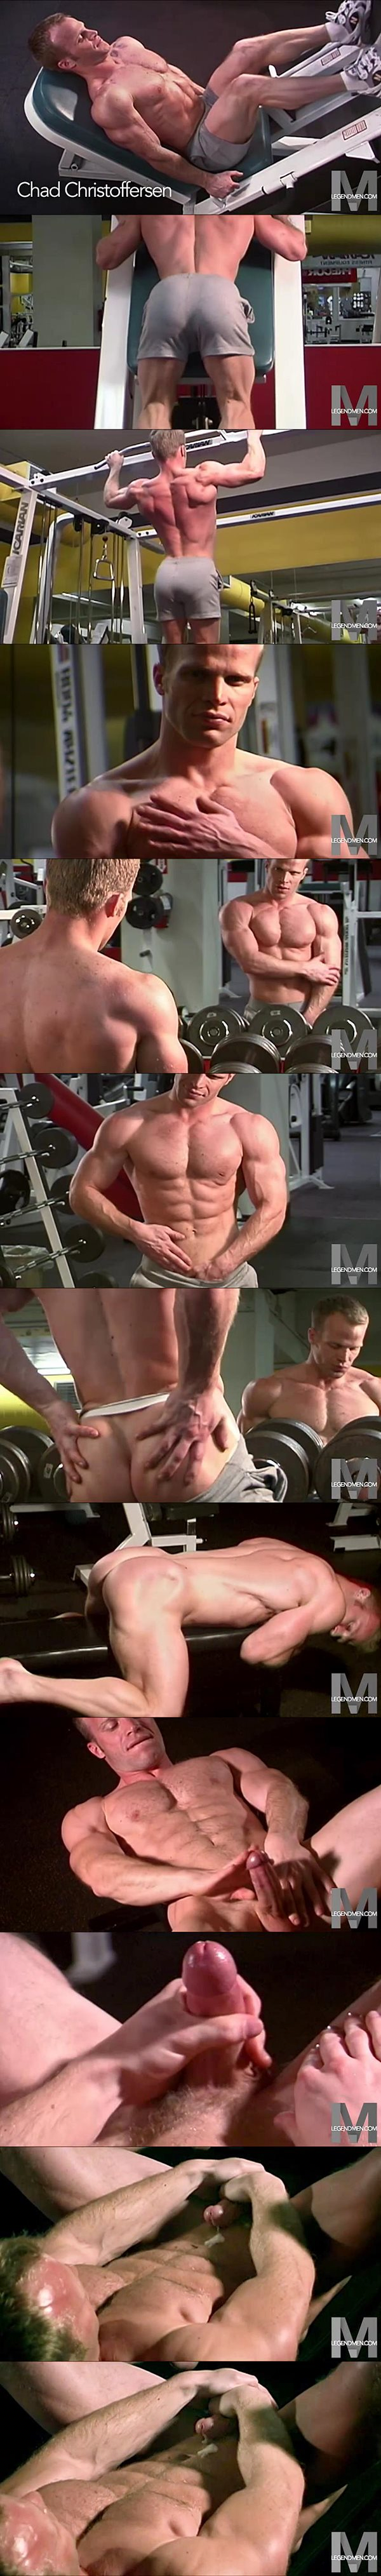 Hot Bodybuilder Chad Christoffersen shoots his thick load at Legendmen